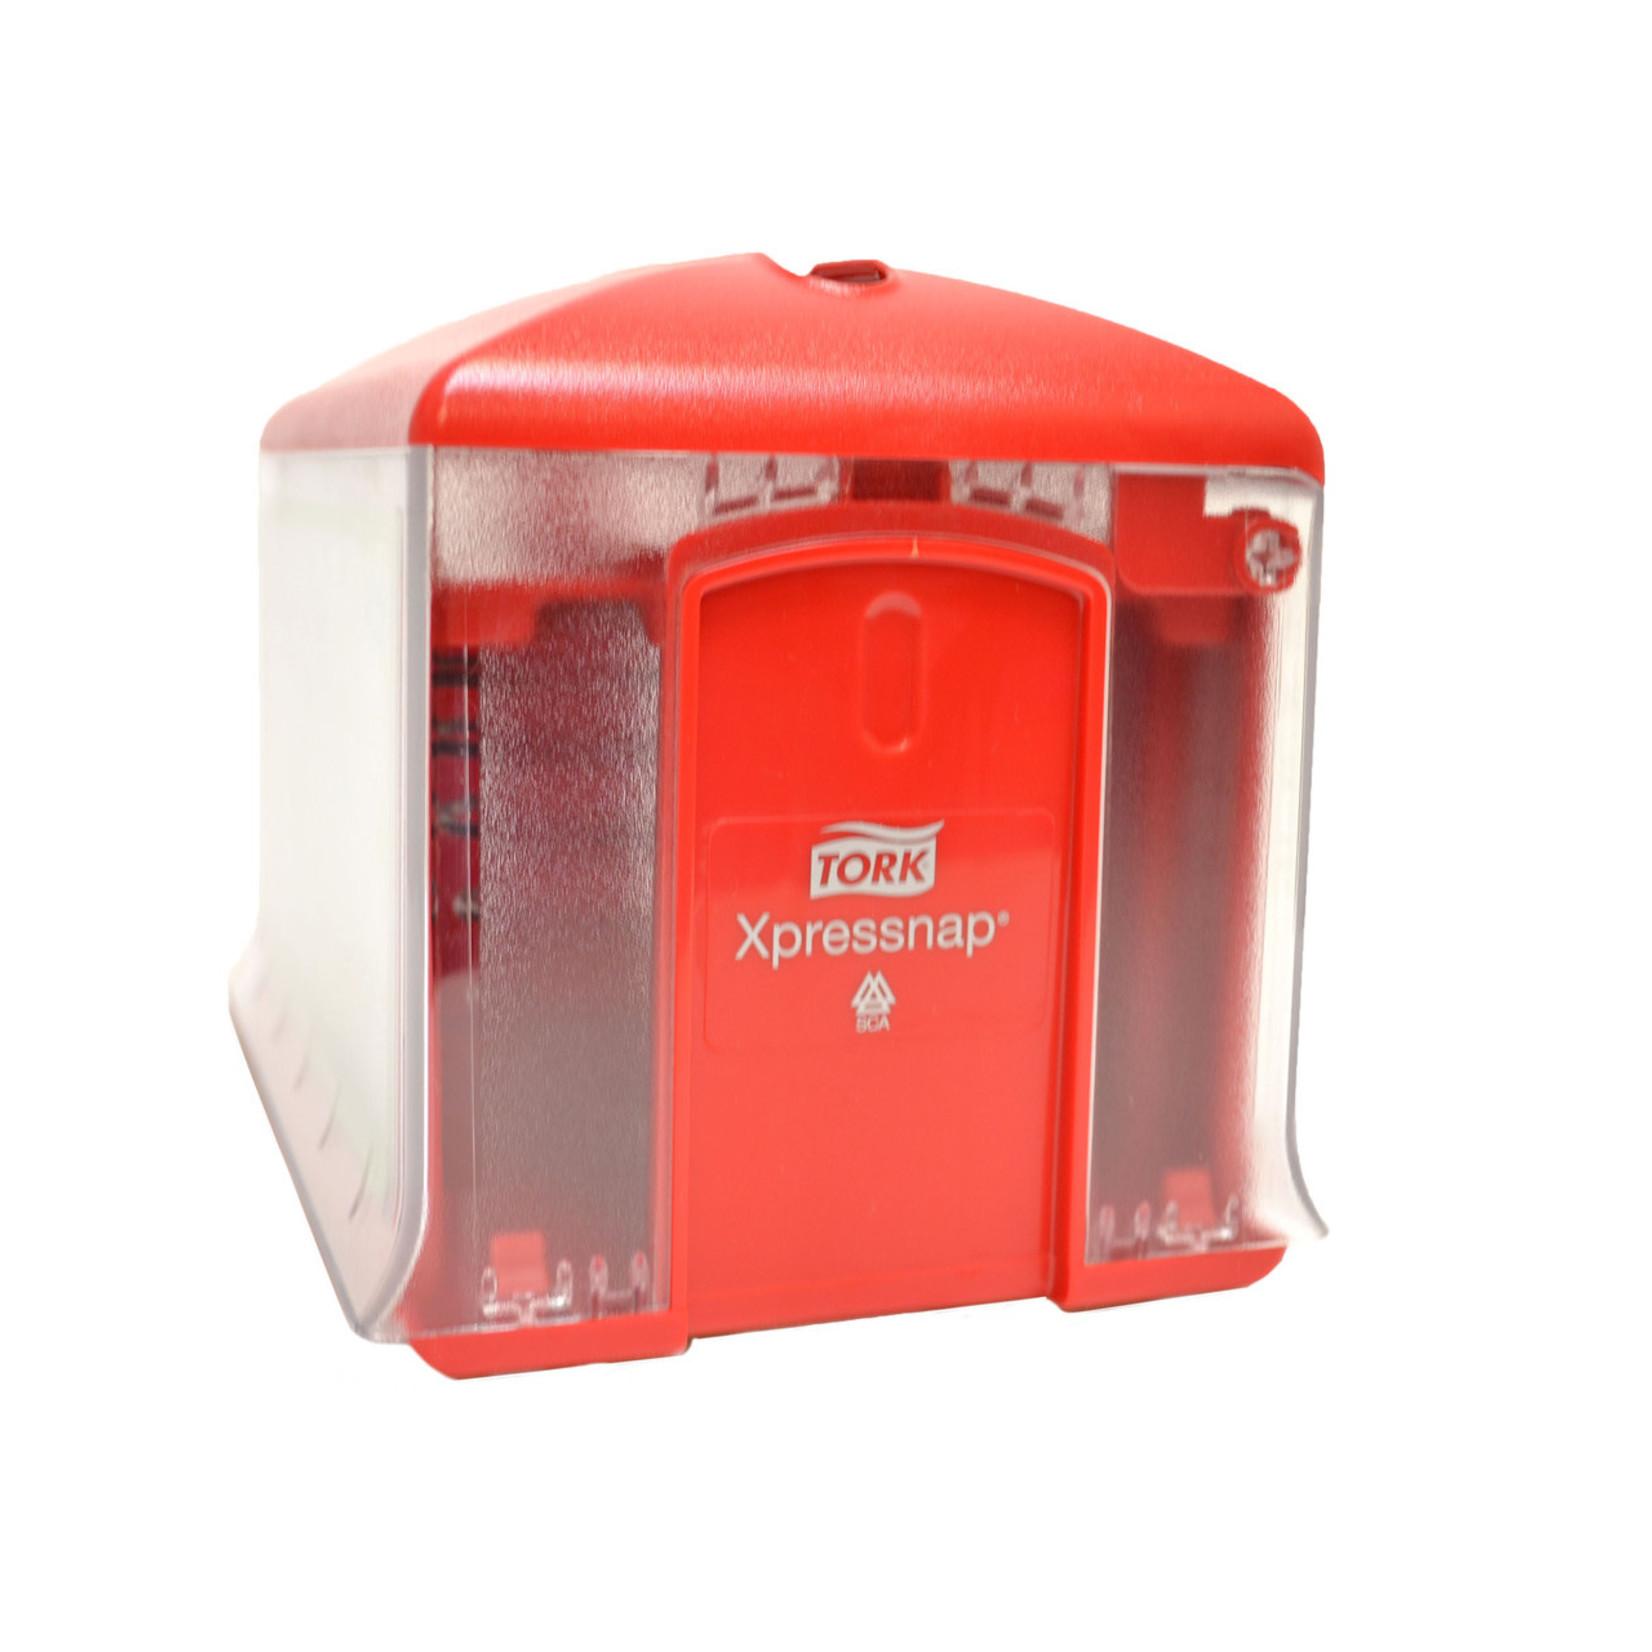 Tork Xpressnap Tabletop Napkin Dispenser